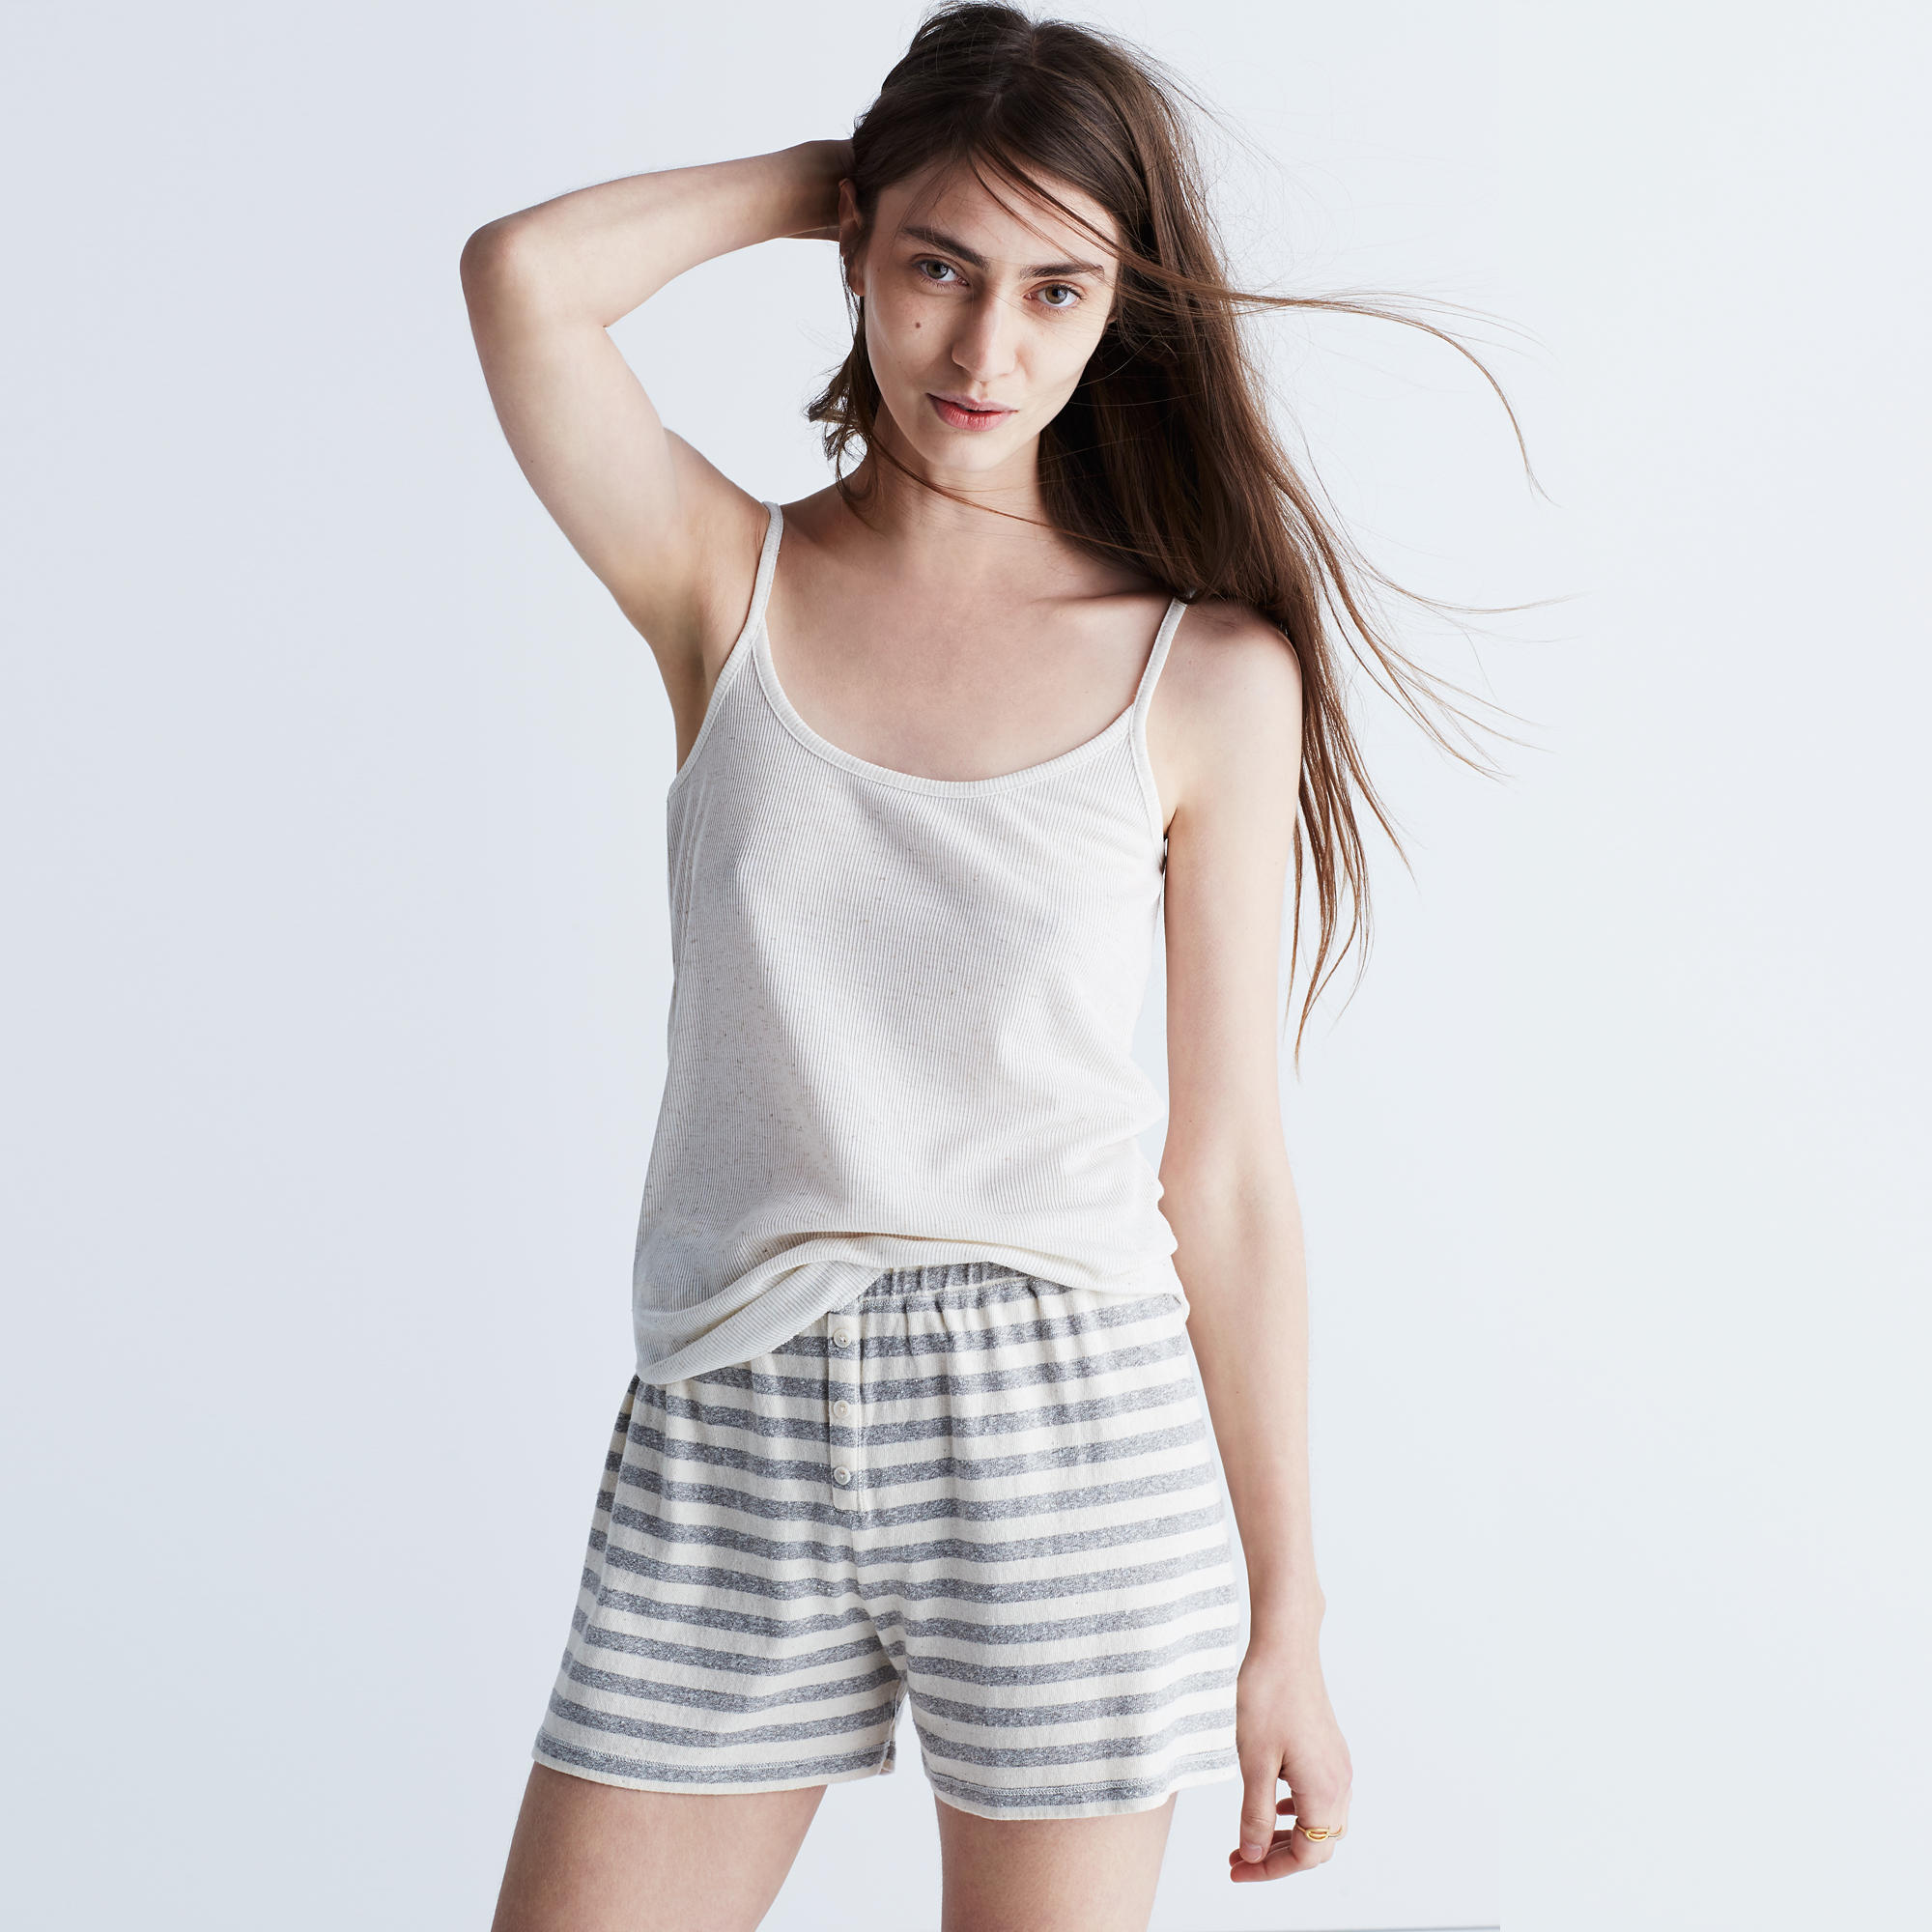 buy grey clothing shop pyjamas pin the next comforter most pajamas print comfortable from uk star online